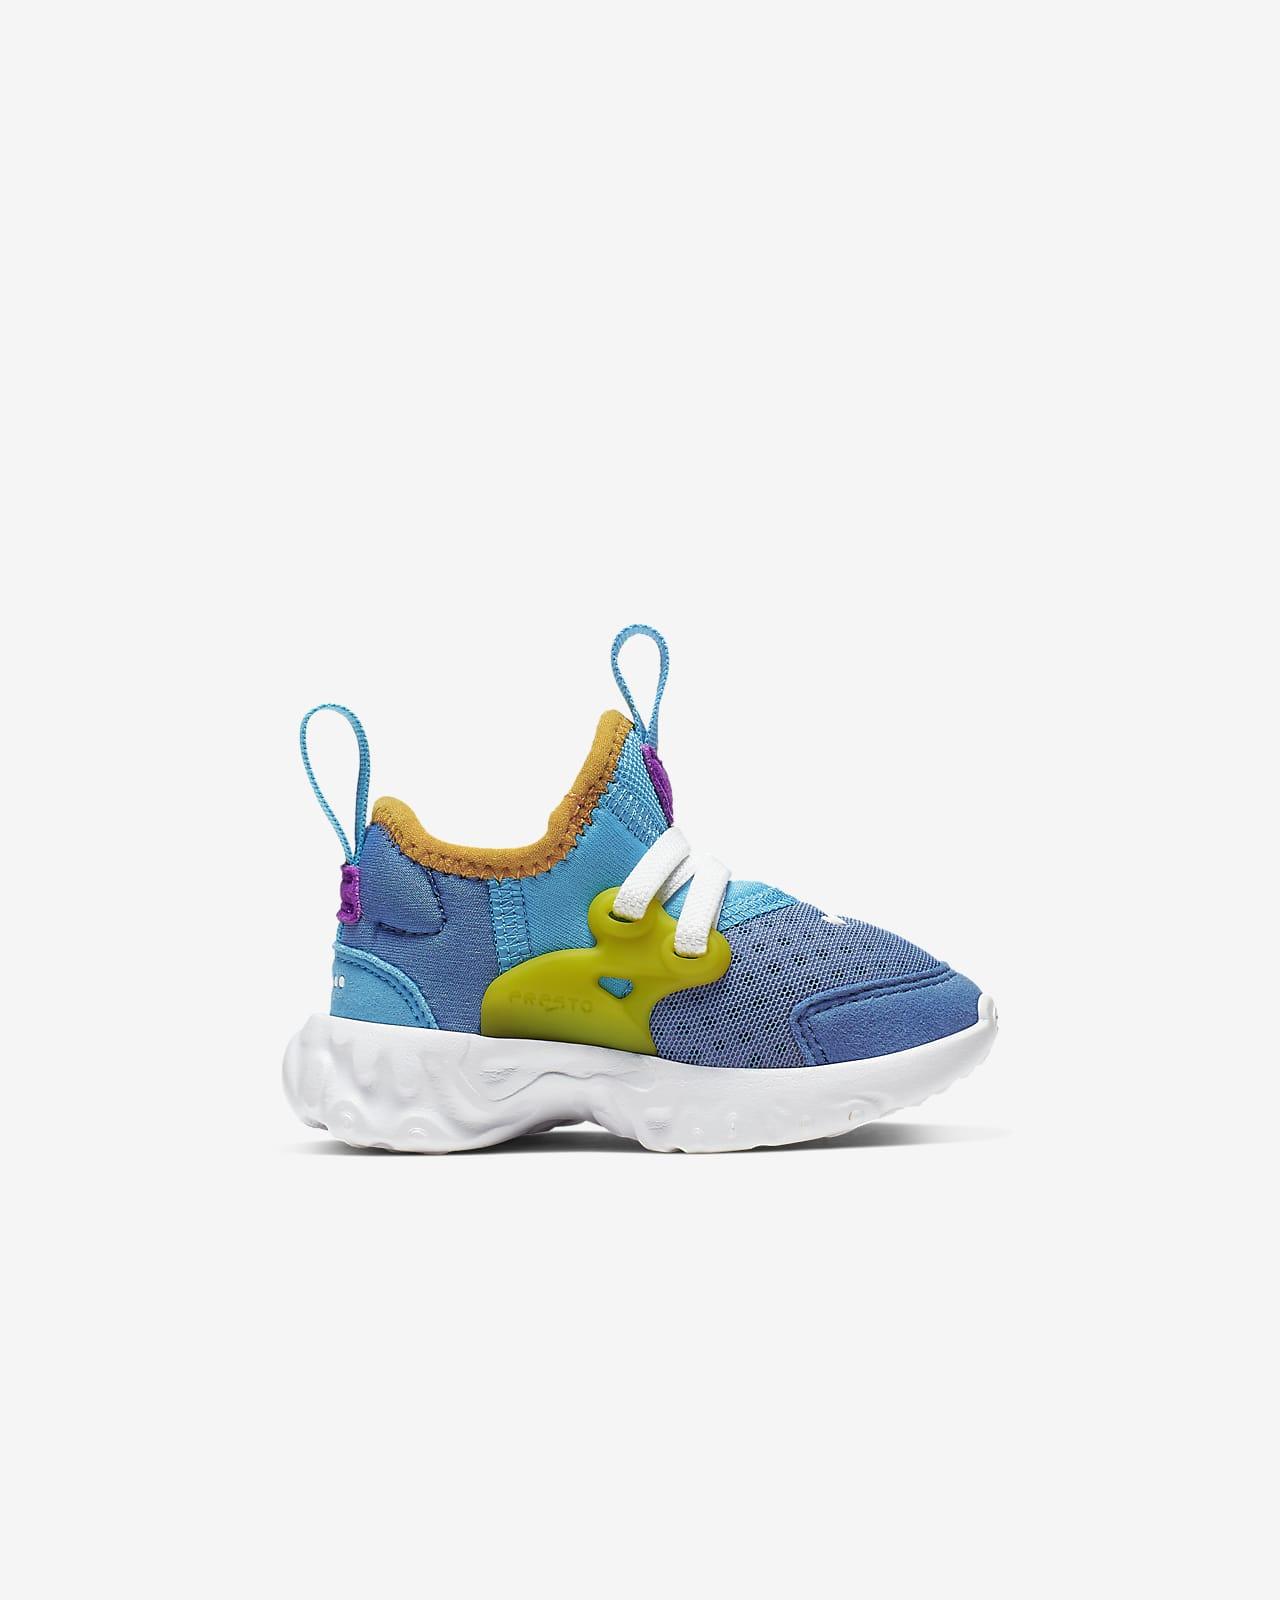 nike presto running shoes